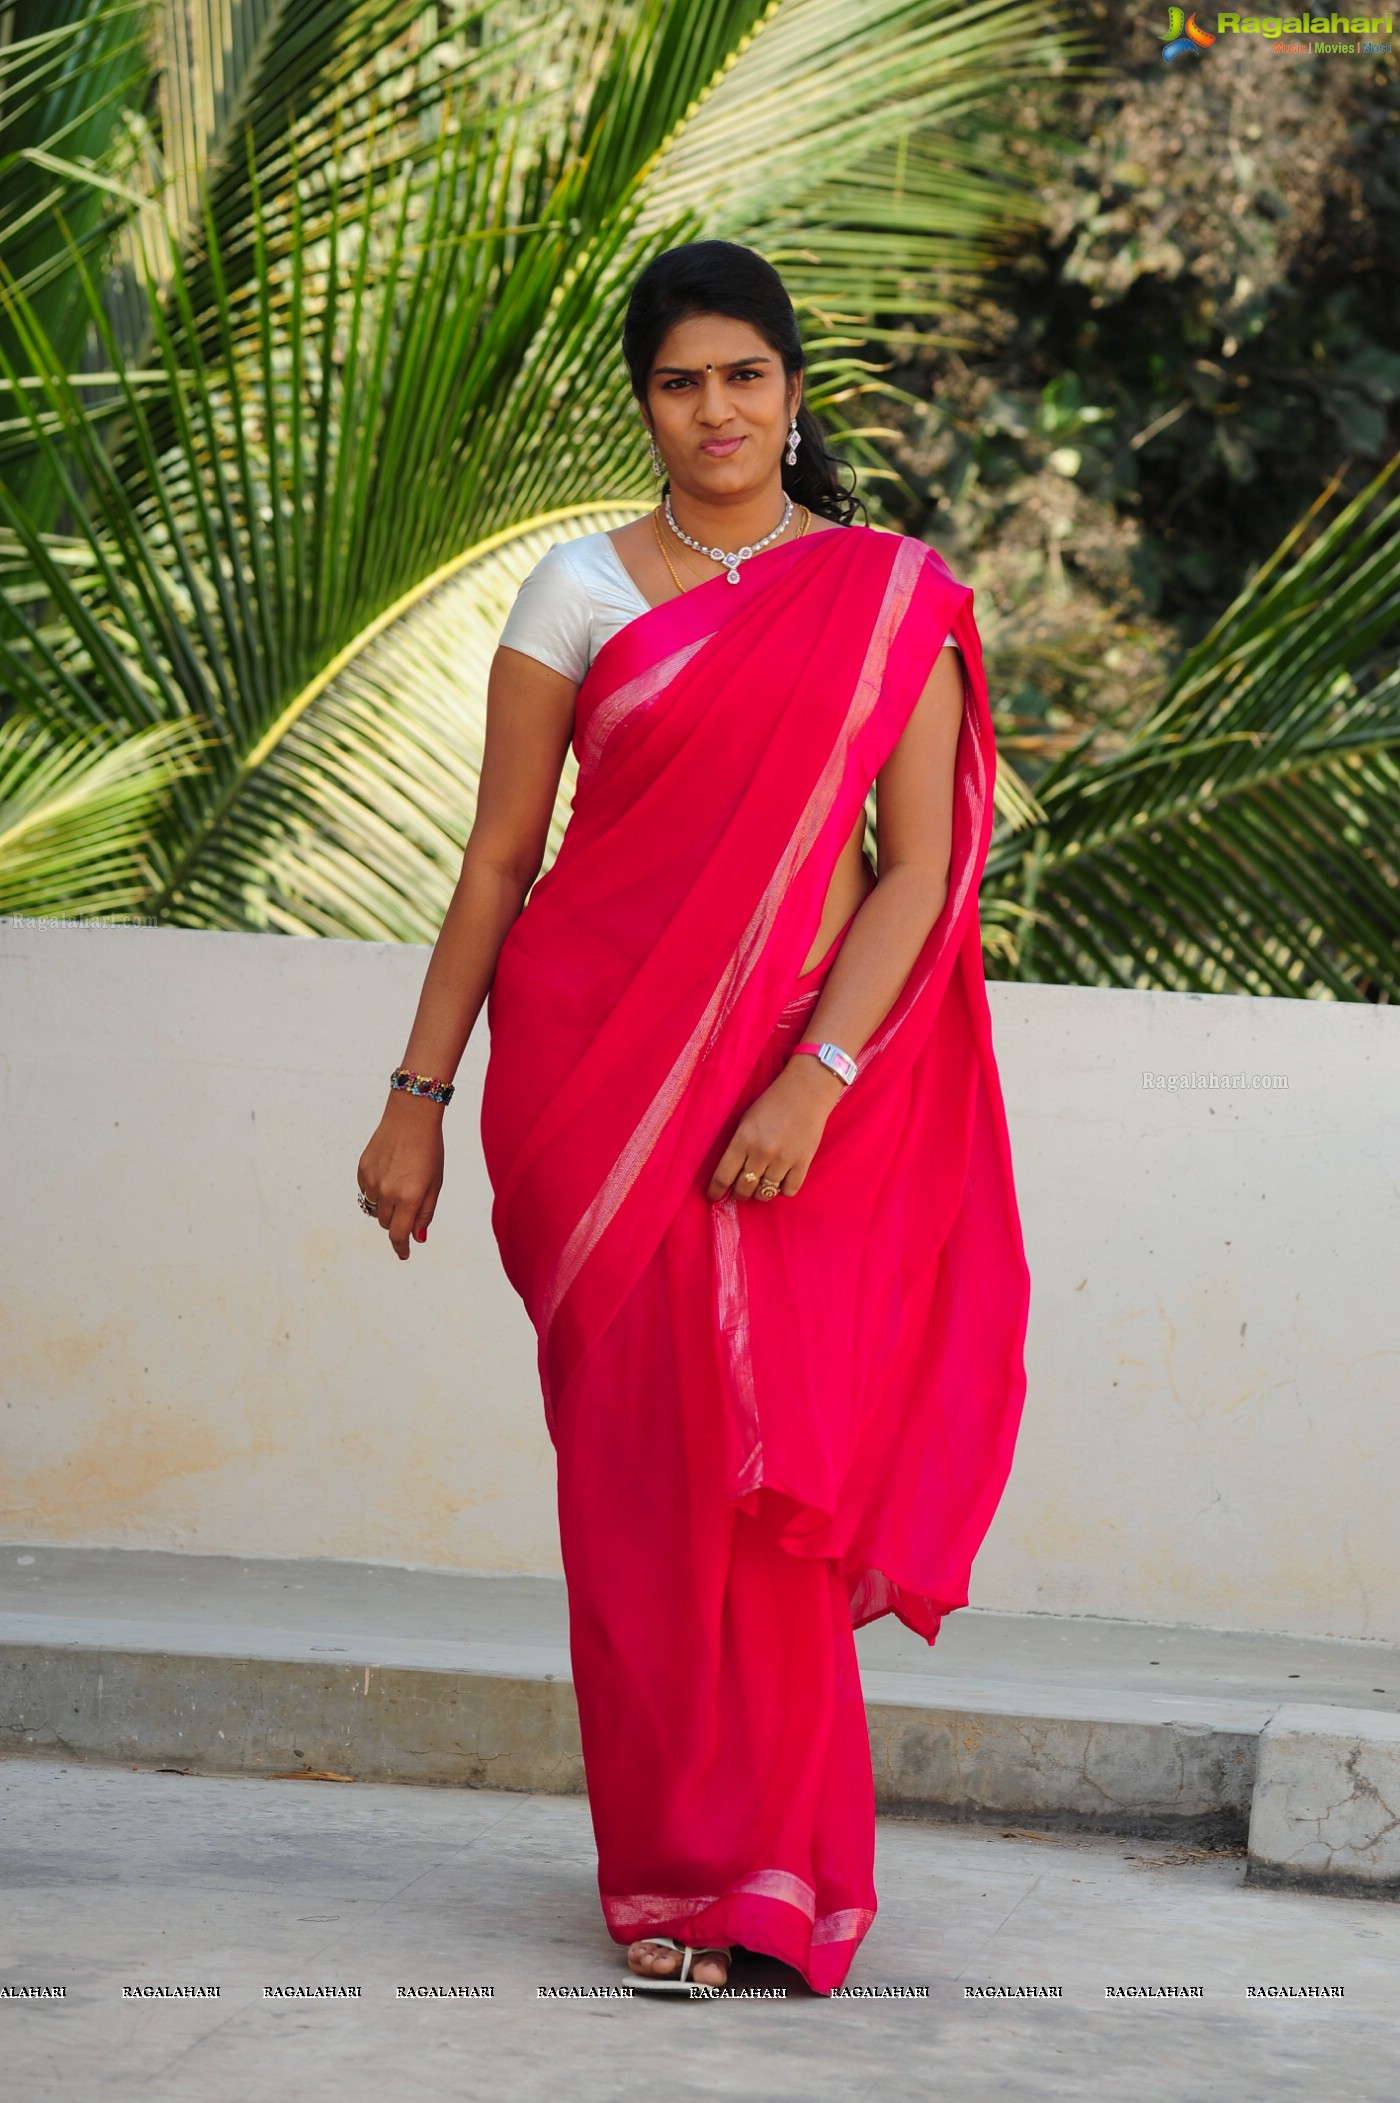 Bhavana posters image 40 telugu actress postersimages photos bhavana posters altavistaventures Gallery